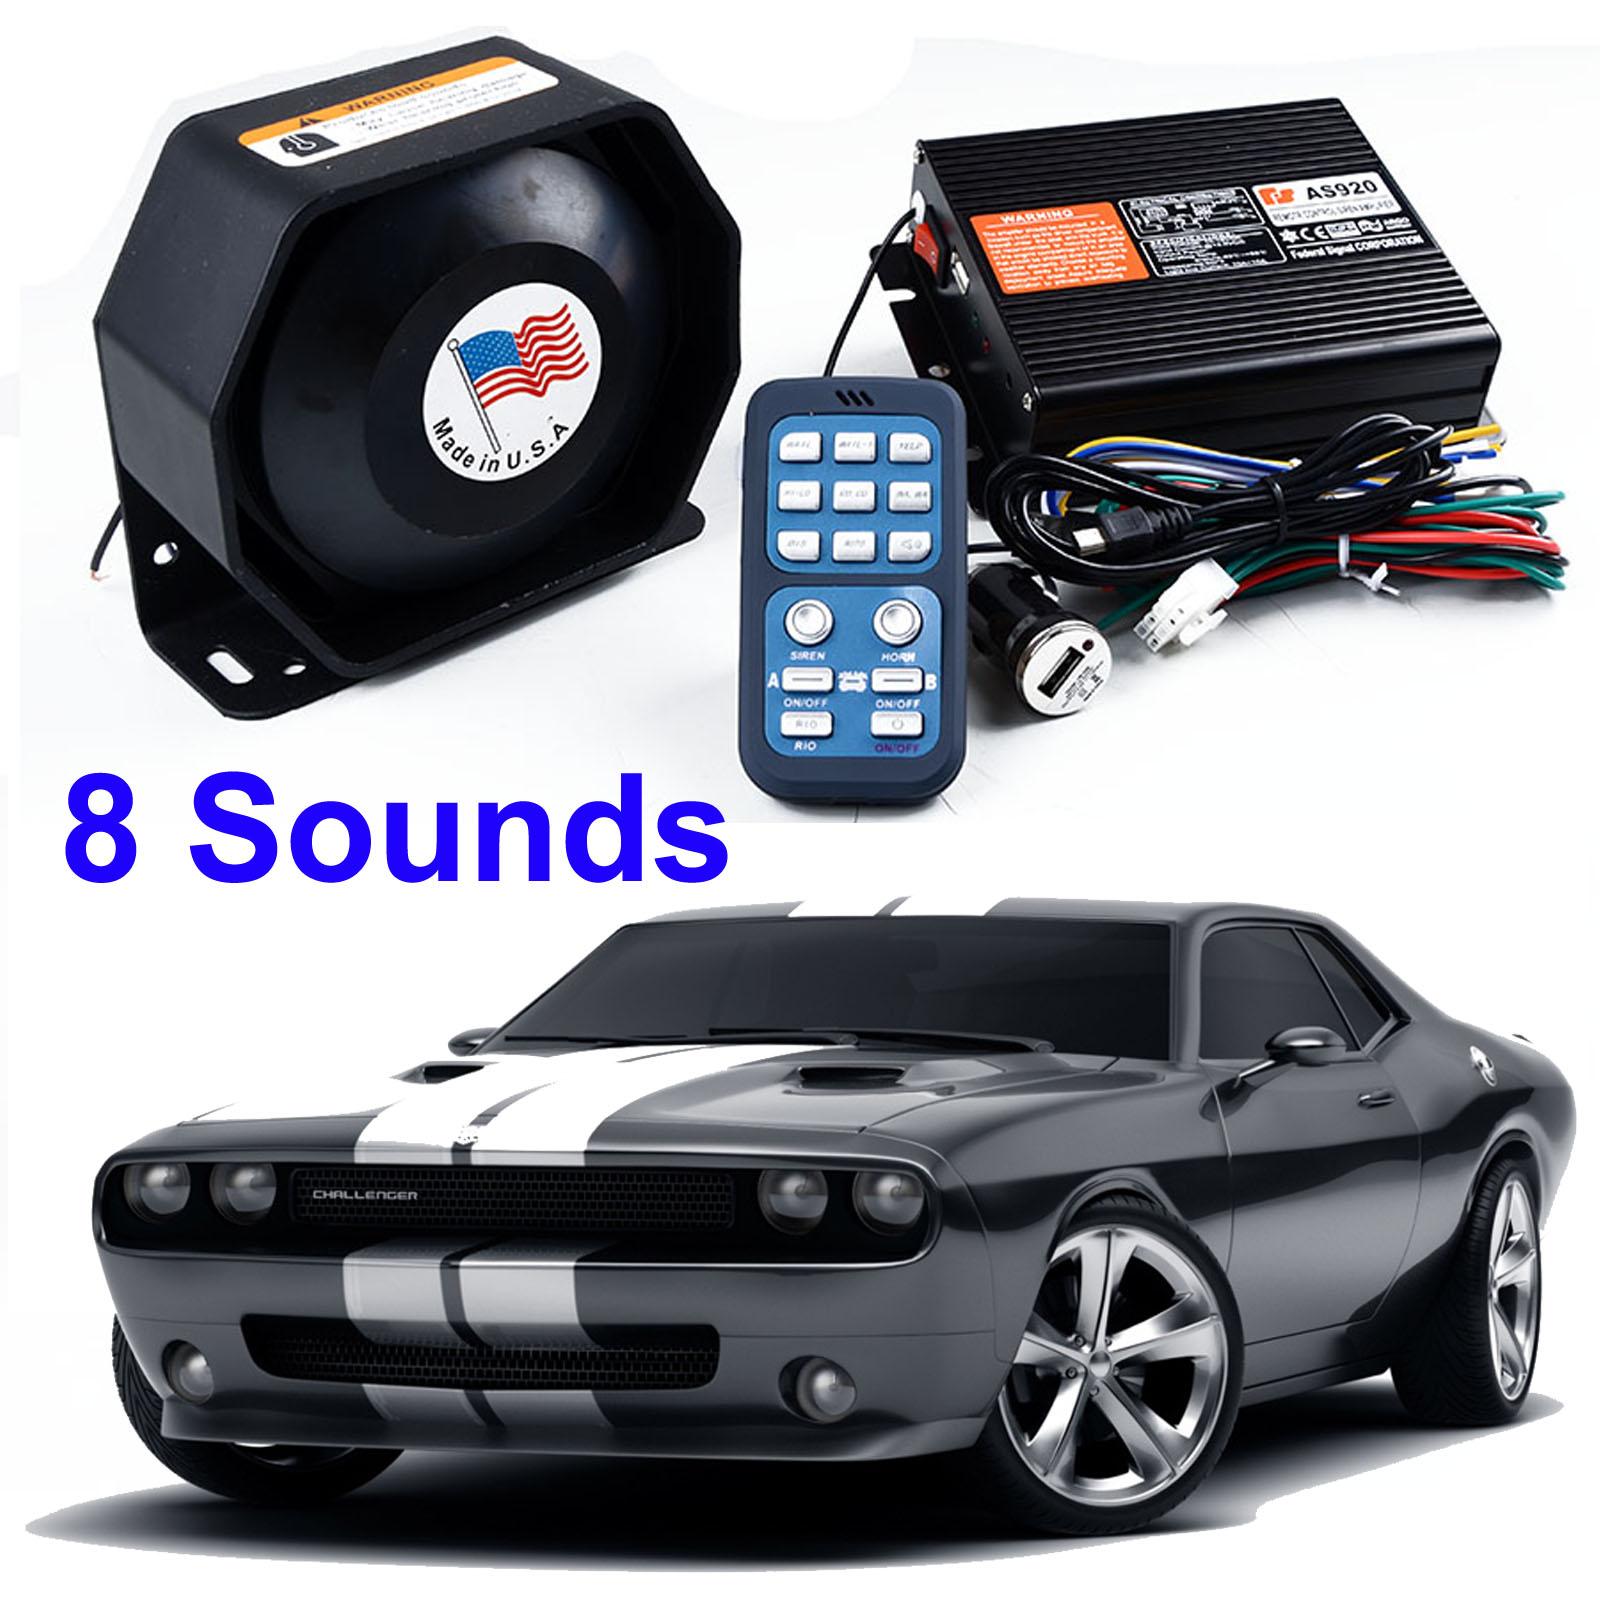 200w 8 Sound Car Warning Alarm Police Fire Siren Horn Ultra Loud Overheating Speaker System